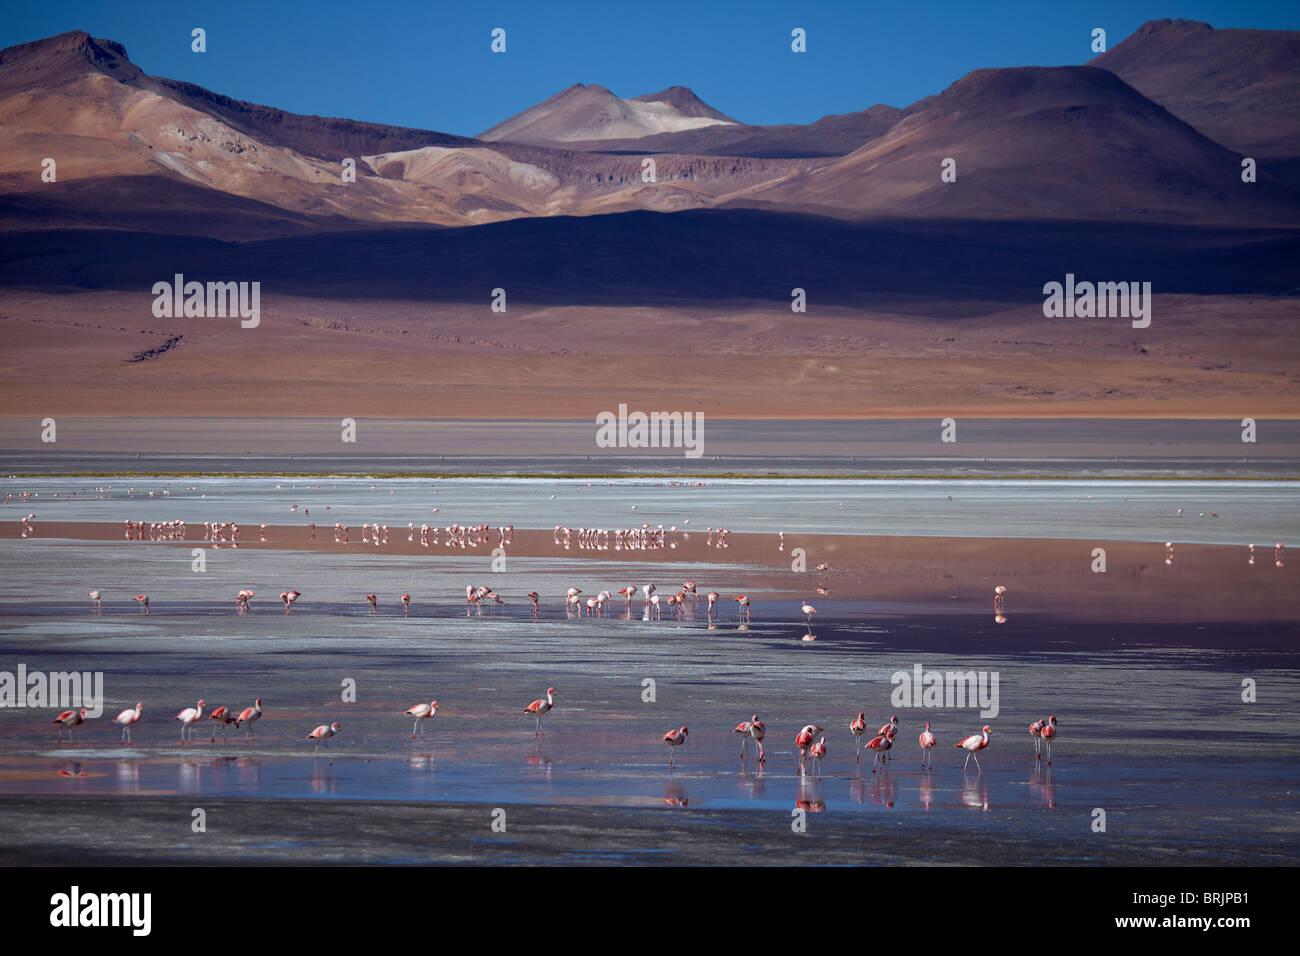 James flamingos on Laguna Colorada, Eduardo Avaroa Andean Fauna National Reserve, Bolivia - Stock Image